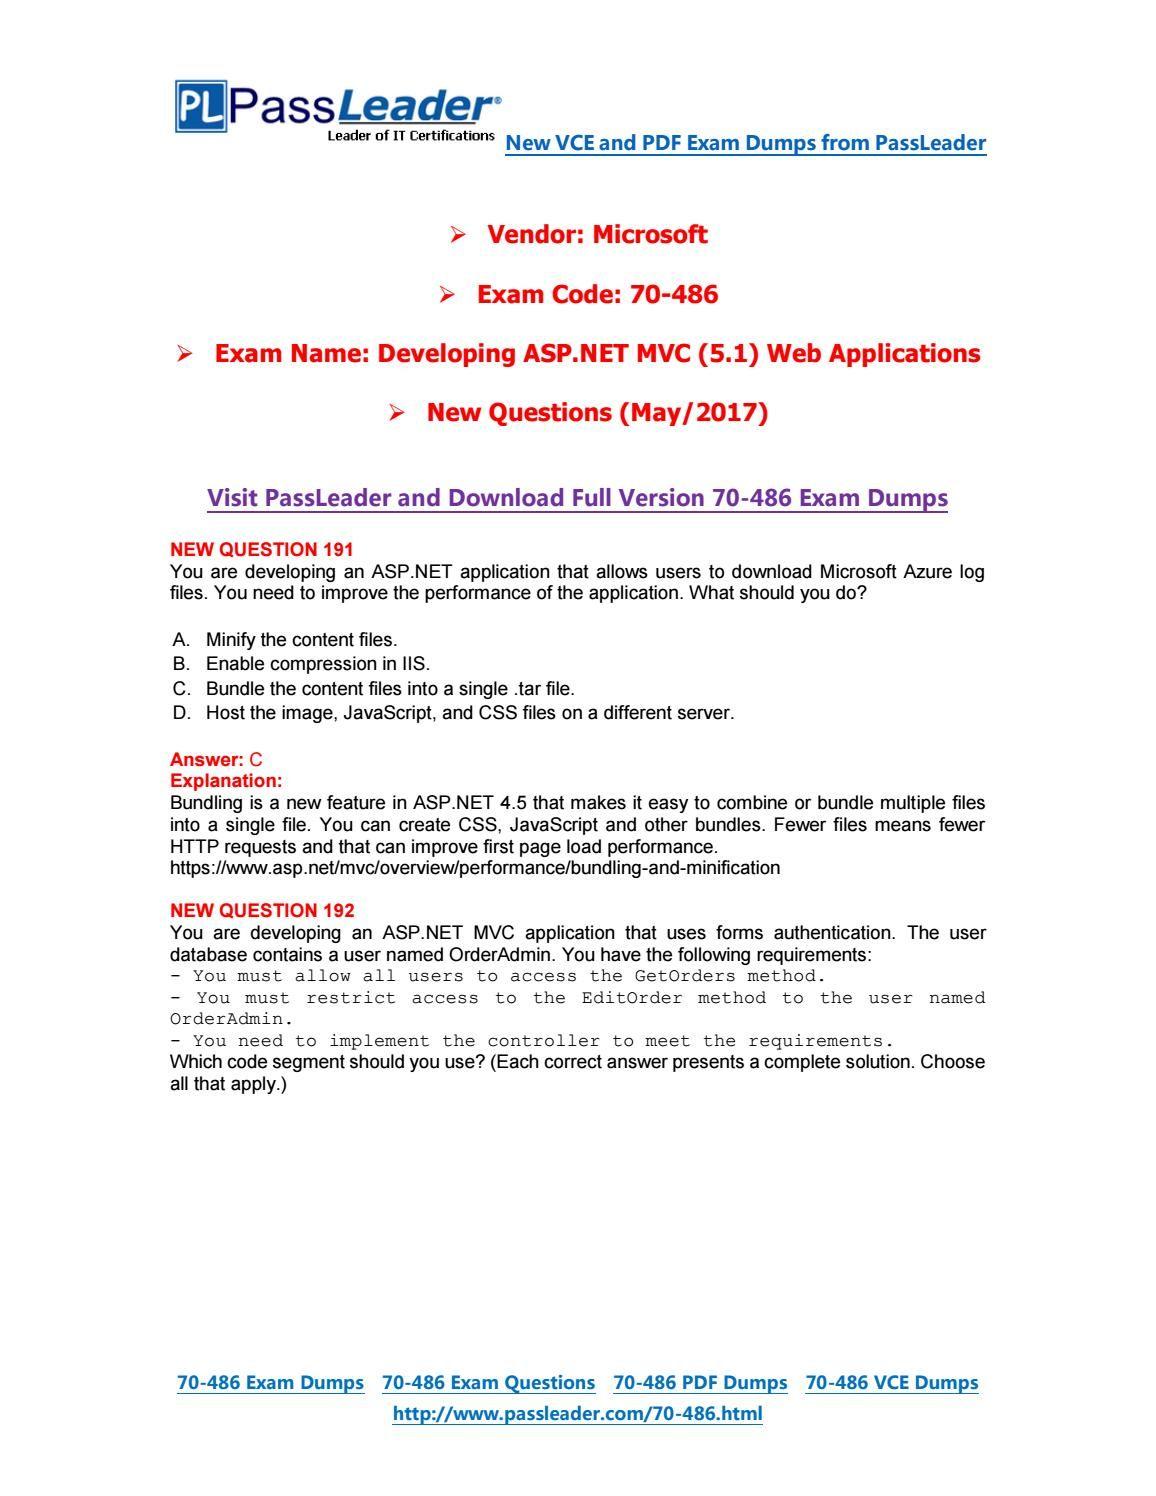 70 533 exam dumps with pdf and vce download 1 20 70 533 exam 70 533 exam dumps with pdf and vce download 1 20 70 533 exam dumps with pdf and vce download pinterest 1betcityfo Image collections